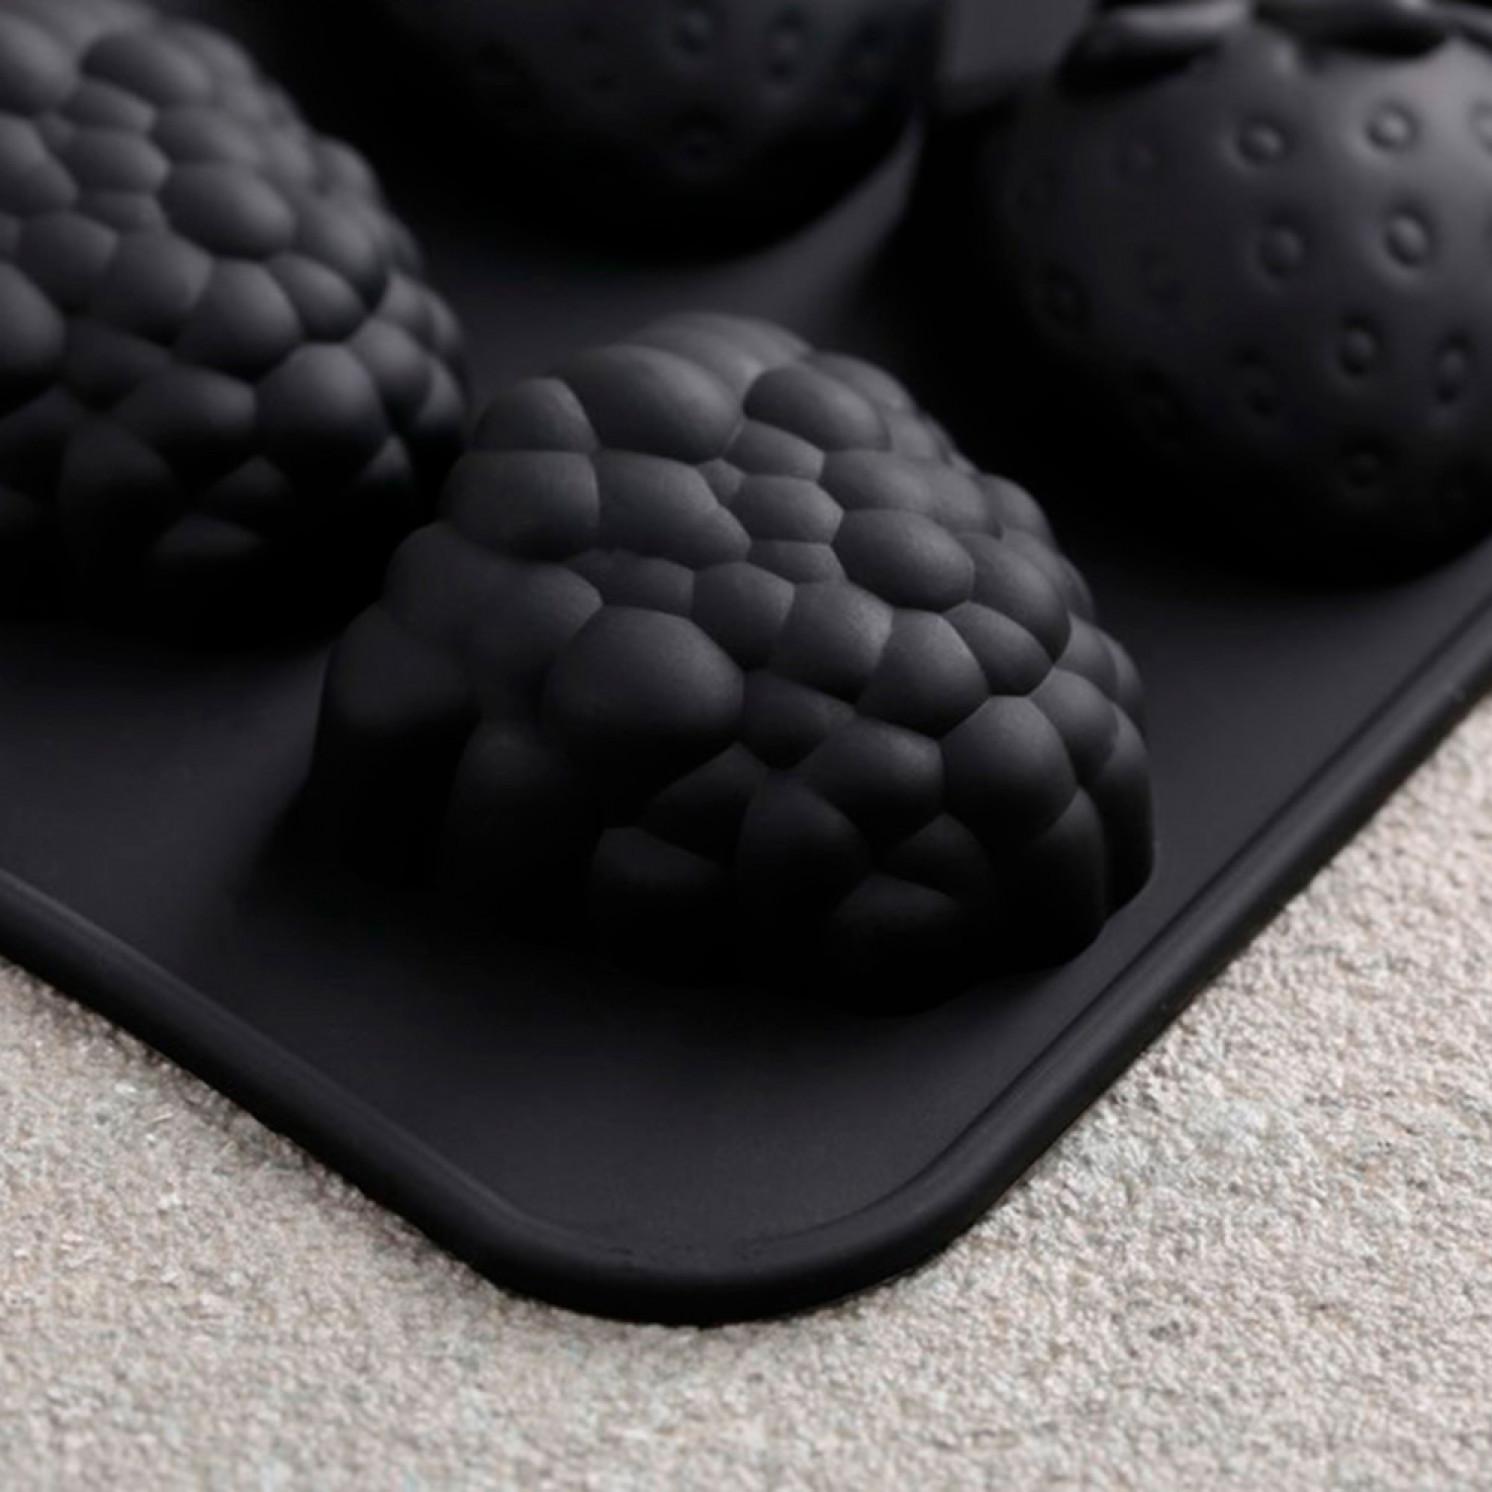 Форма для шоколада и мармелада «Мармеладные ягоды», 15 ячеек